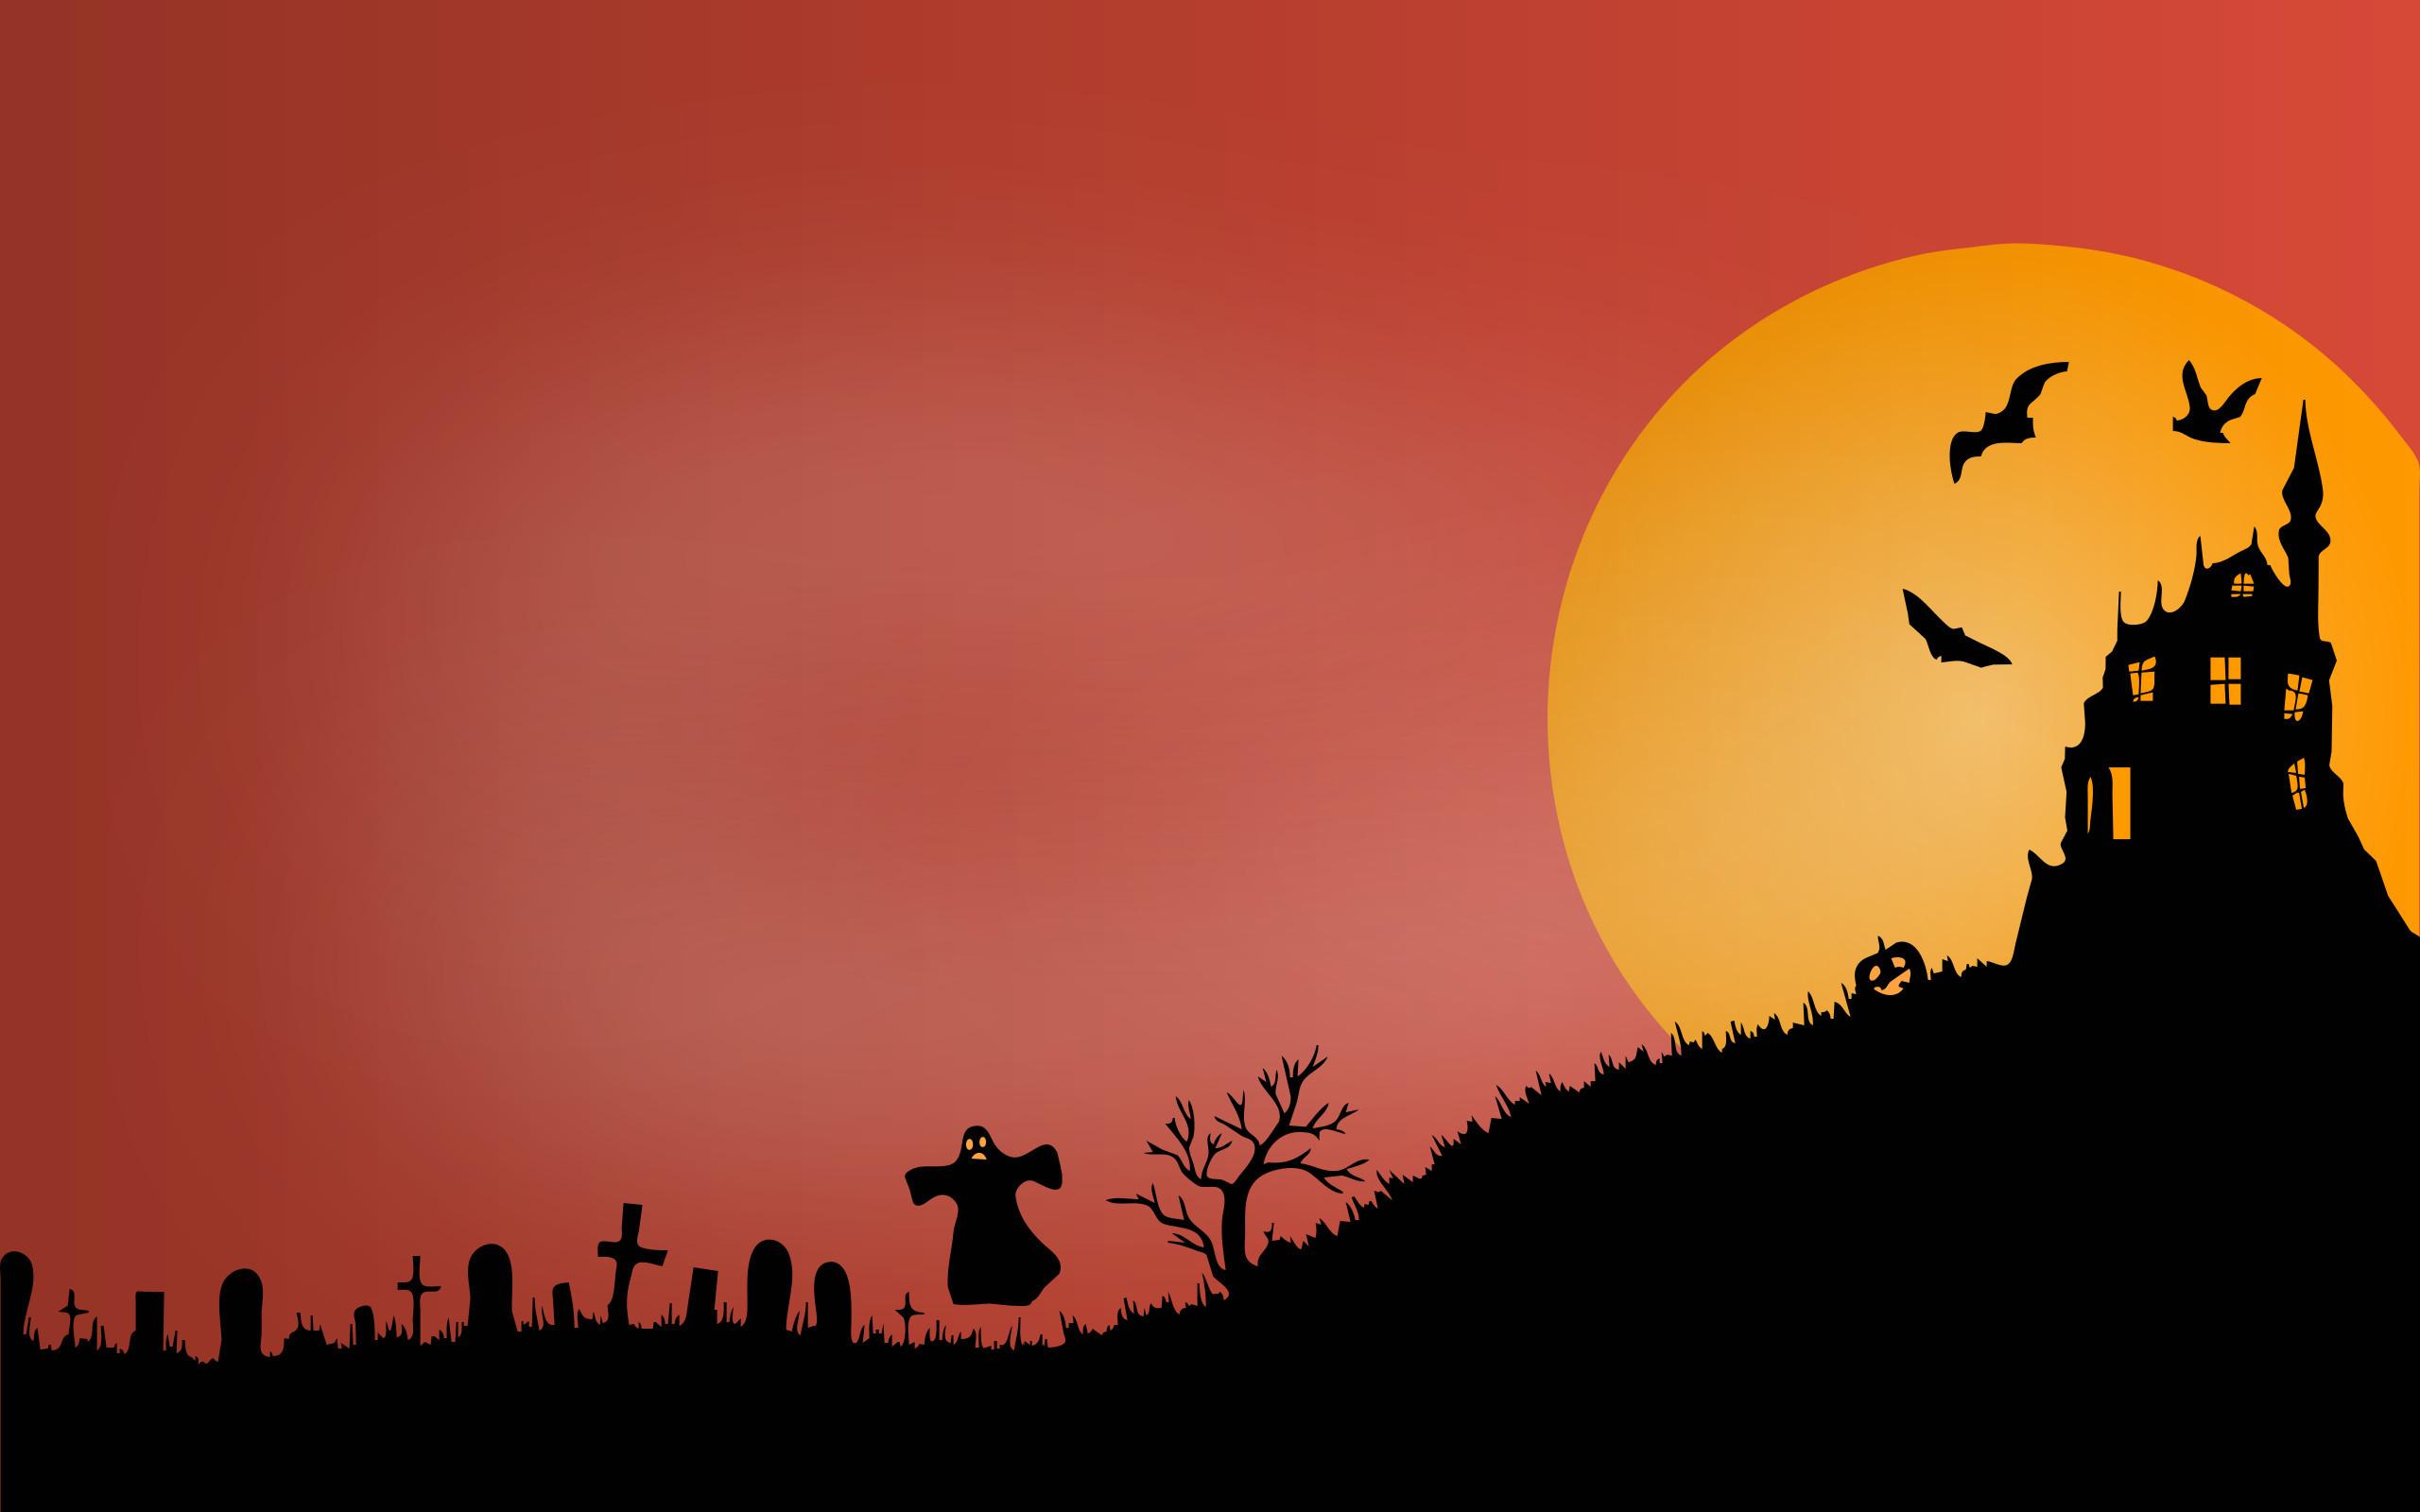 … how to install the Numix Halloween Wallpaper 1.0 on Ubuntu 14.04 Trusty  Tahr, Ubuntu 13.10